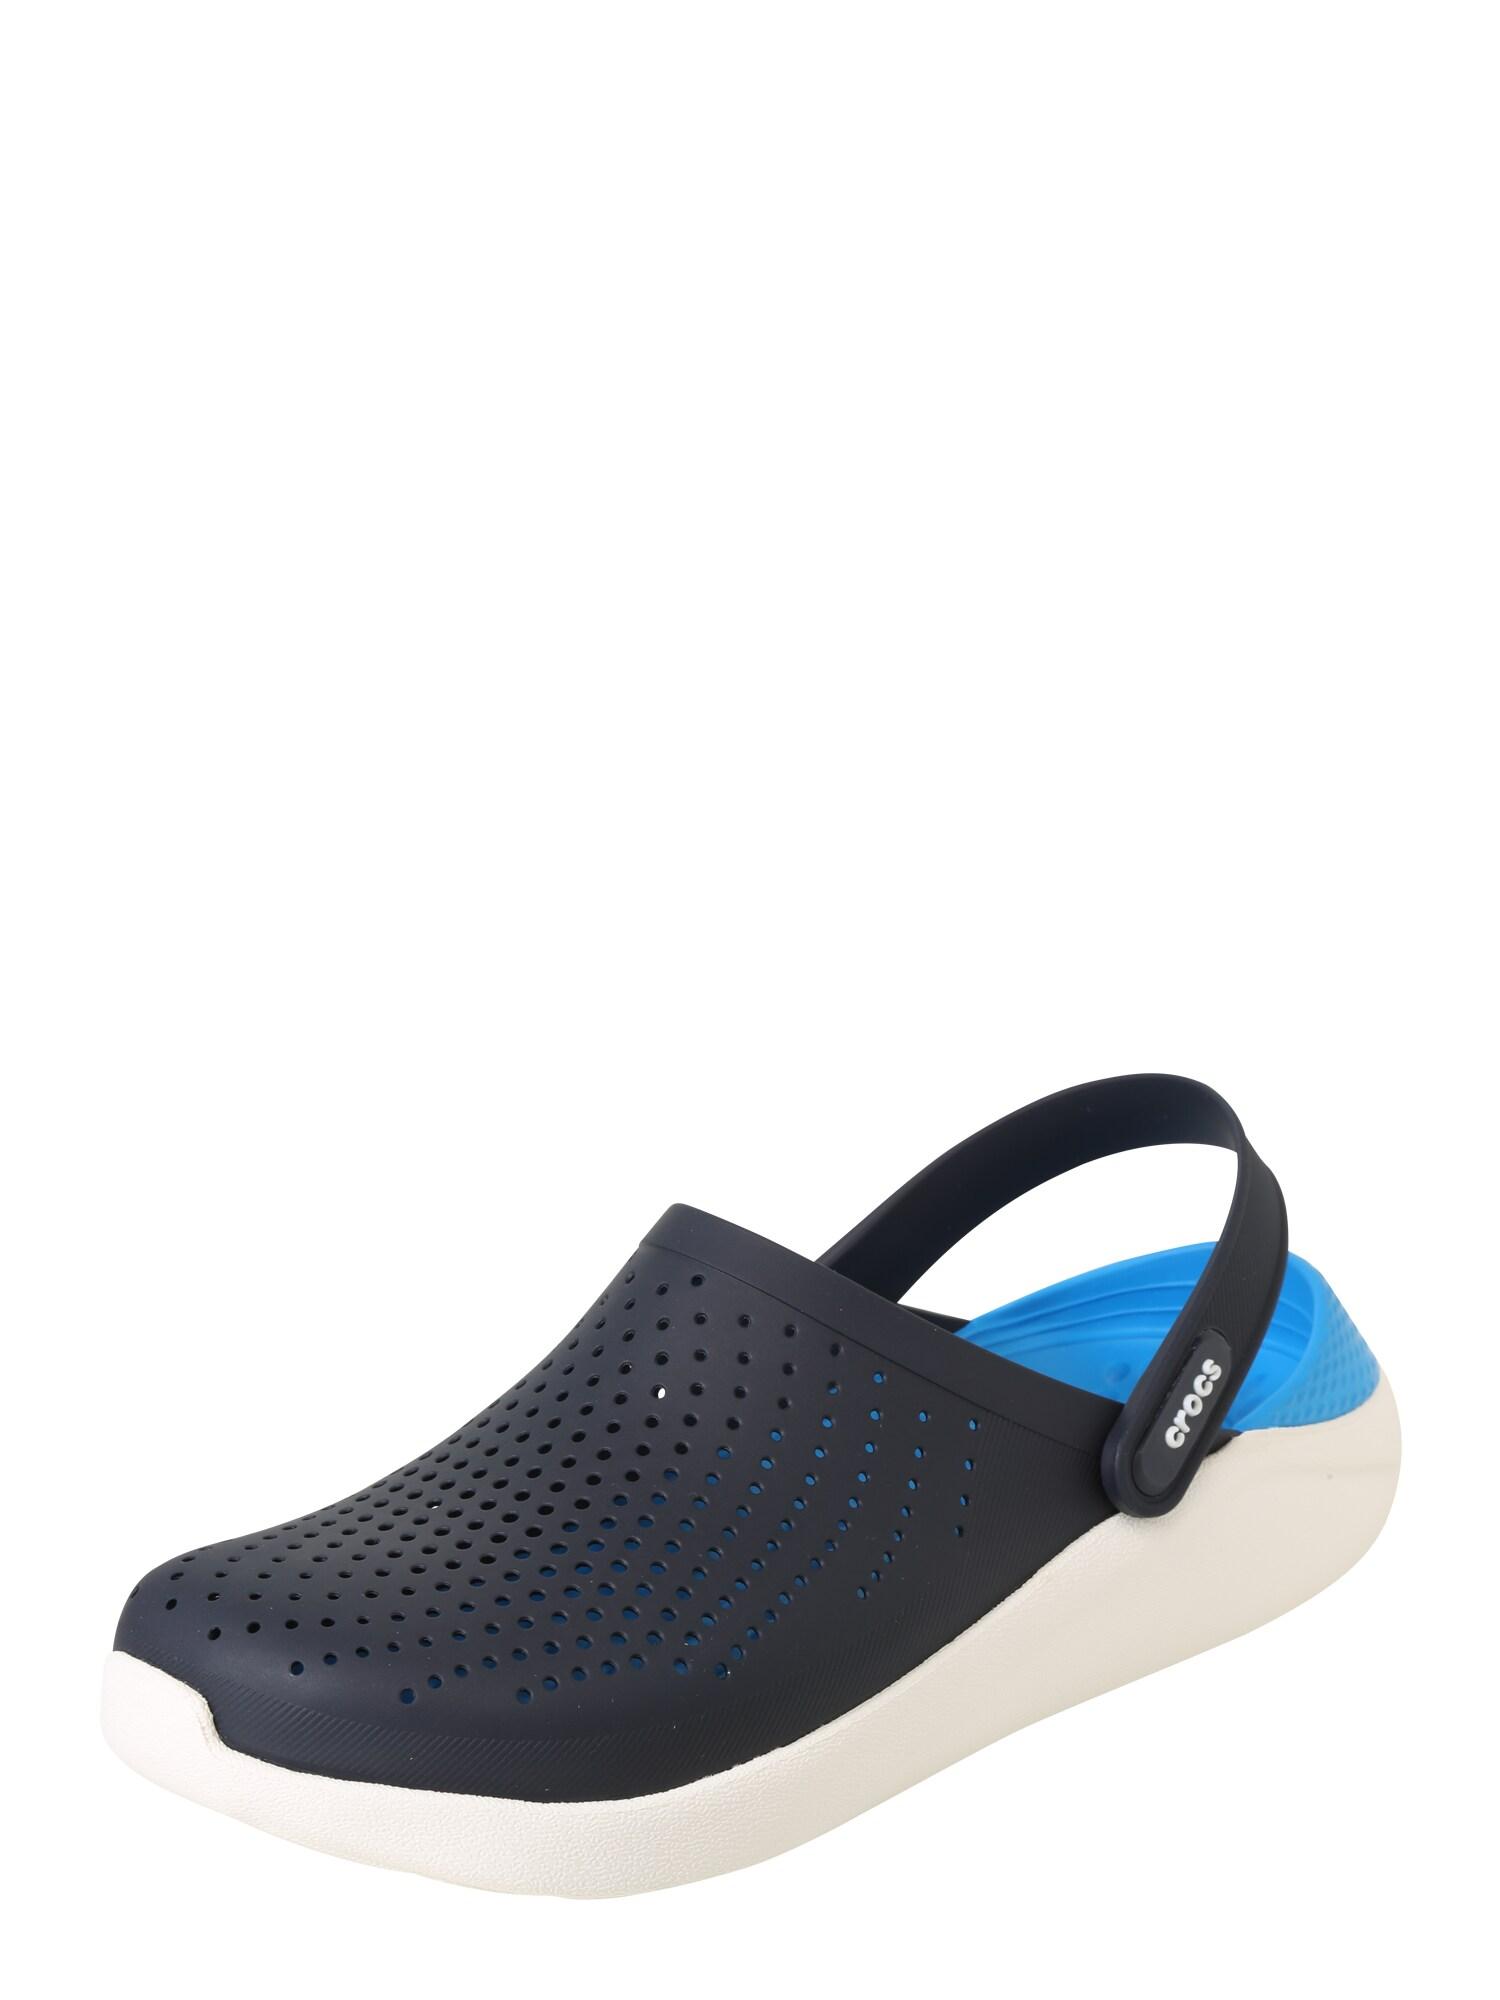 Pantofle Rite Lite námořnická modř Crocs